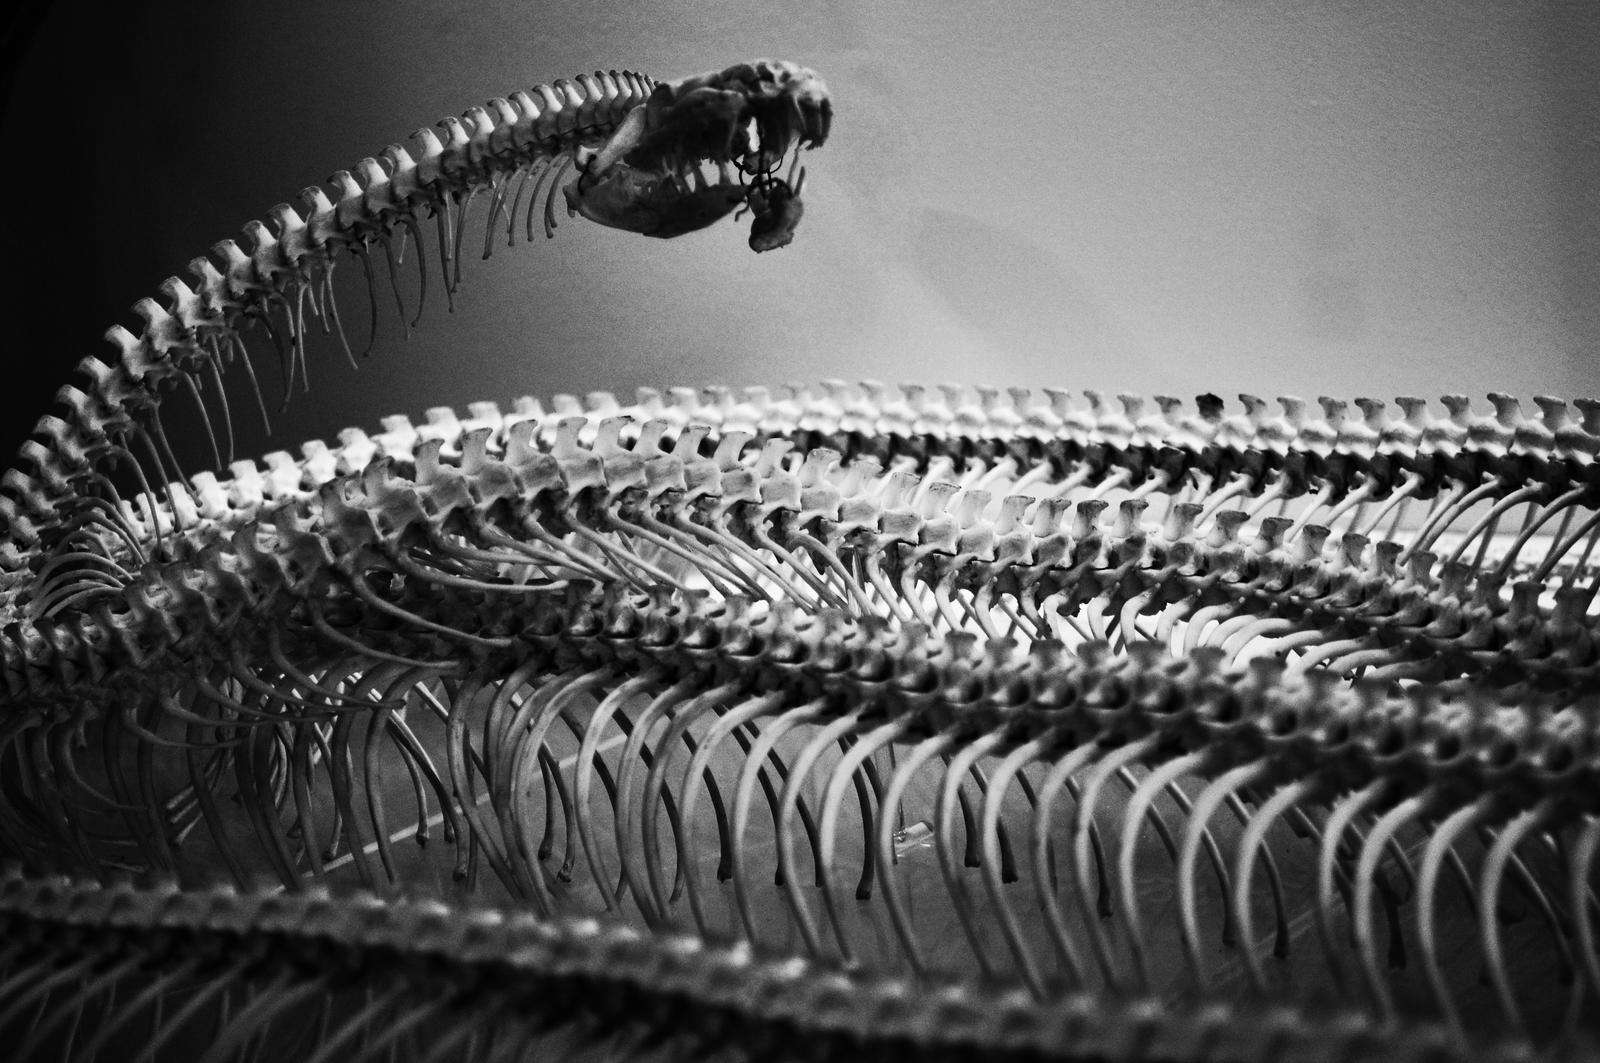 Snake by Cherryred5